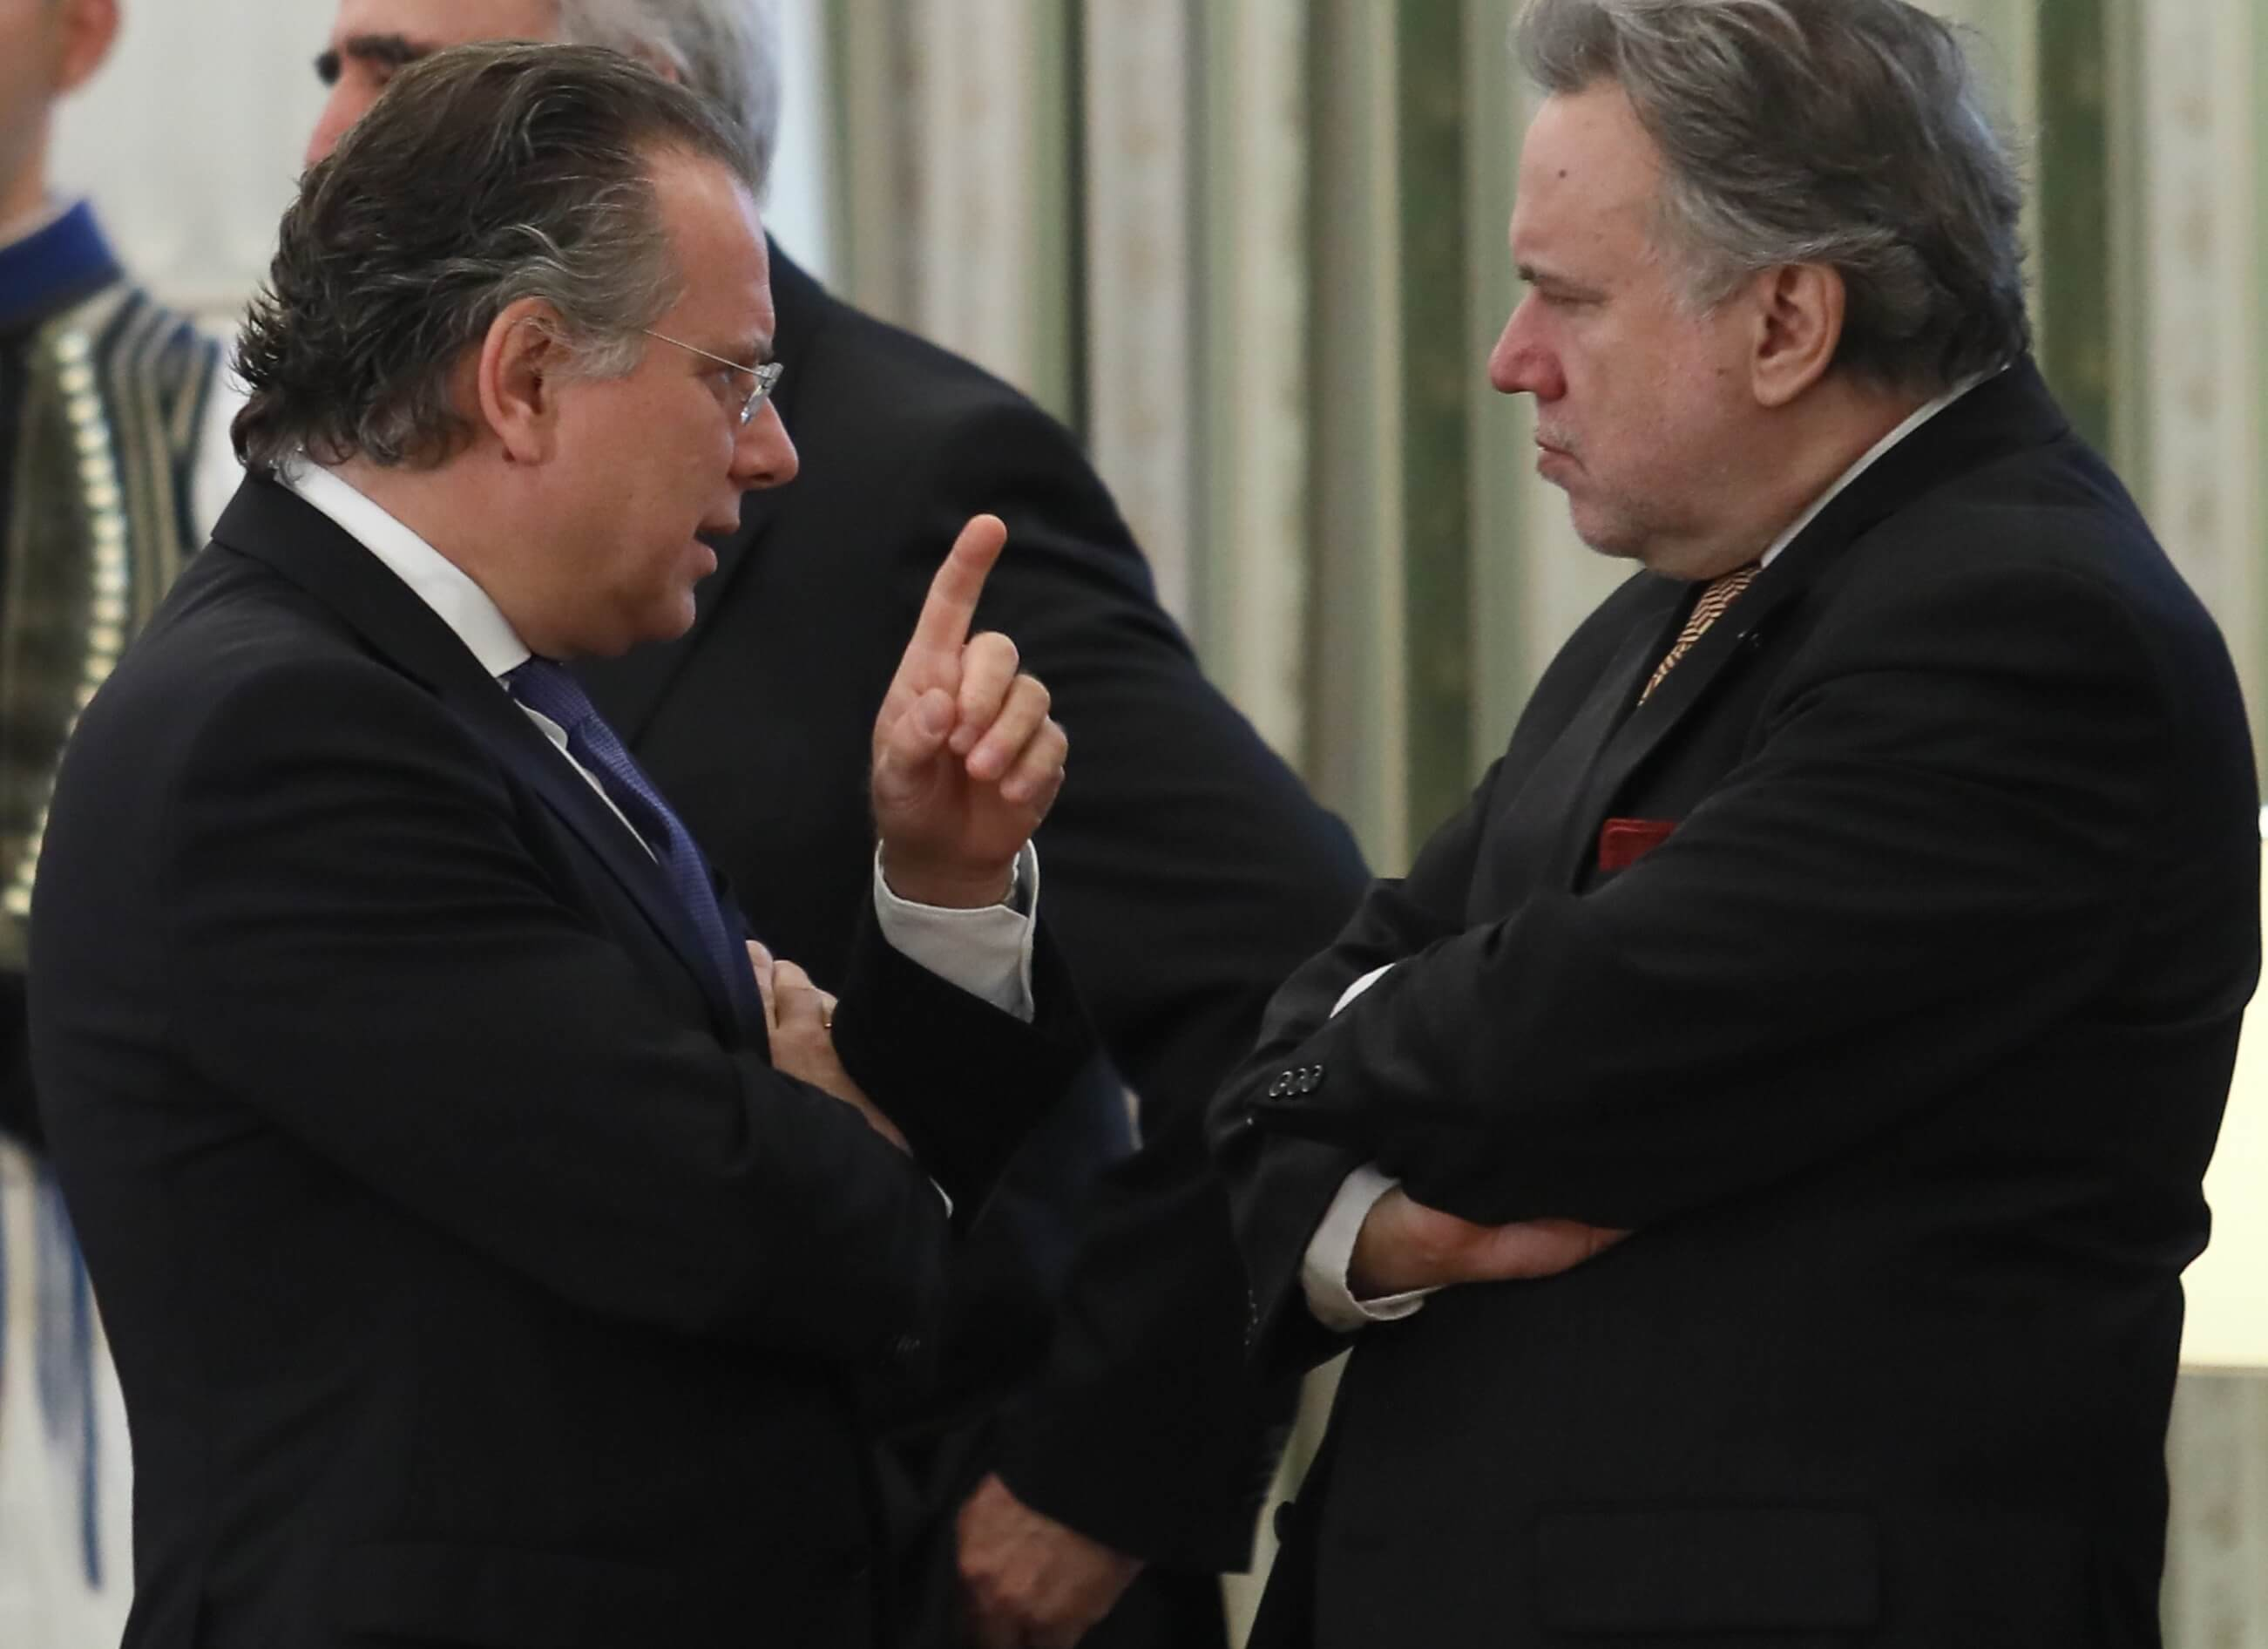 Debate στο newsit.gr: Γιώργος Κατρούγκαλος εναντίον Γιώργου Κουμουτσάκου – Στείλτε τα ερωτήματά σας